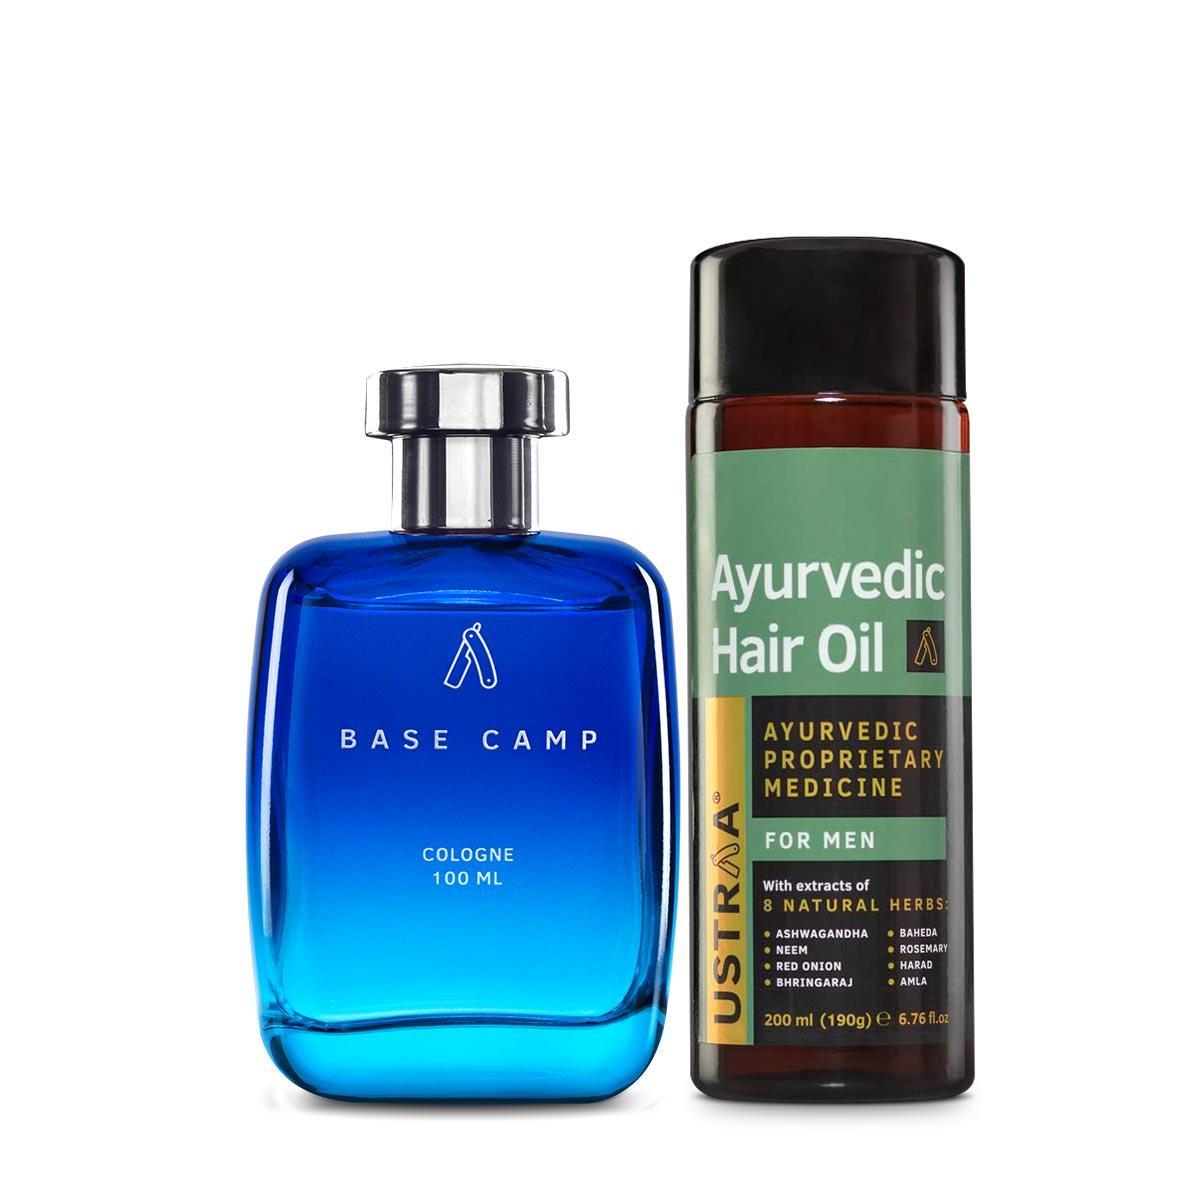 Ayurvedic Hair Oil & Cologne- Base Camp